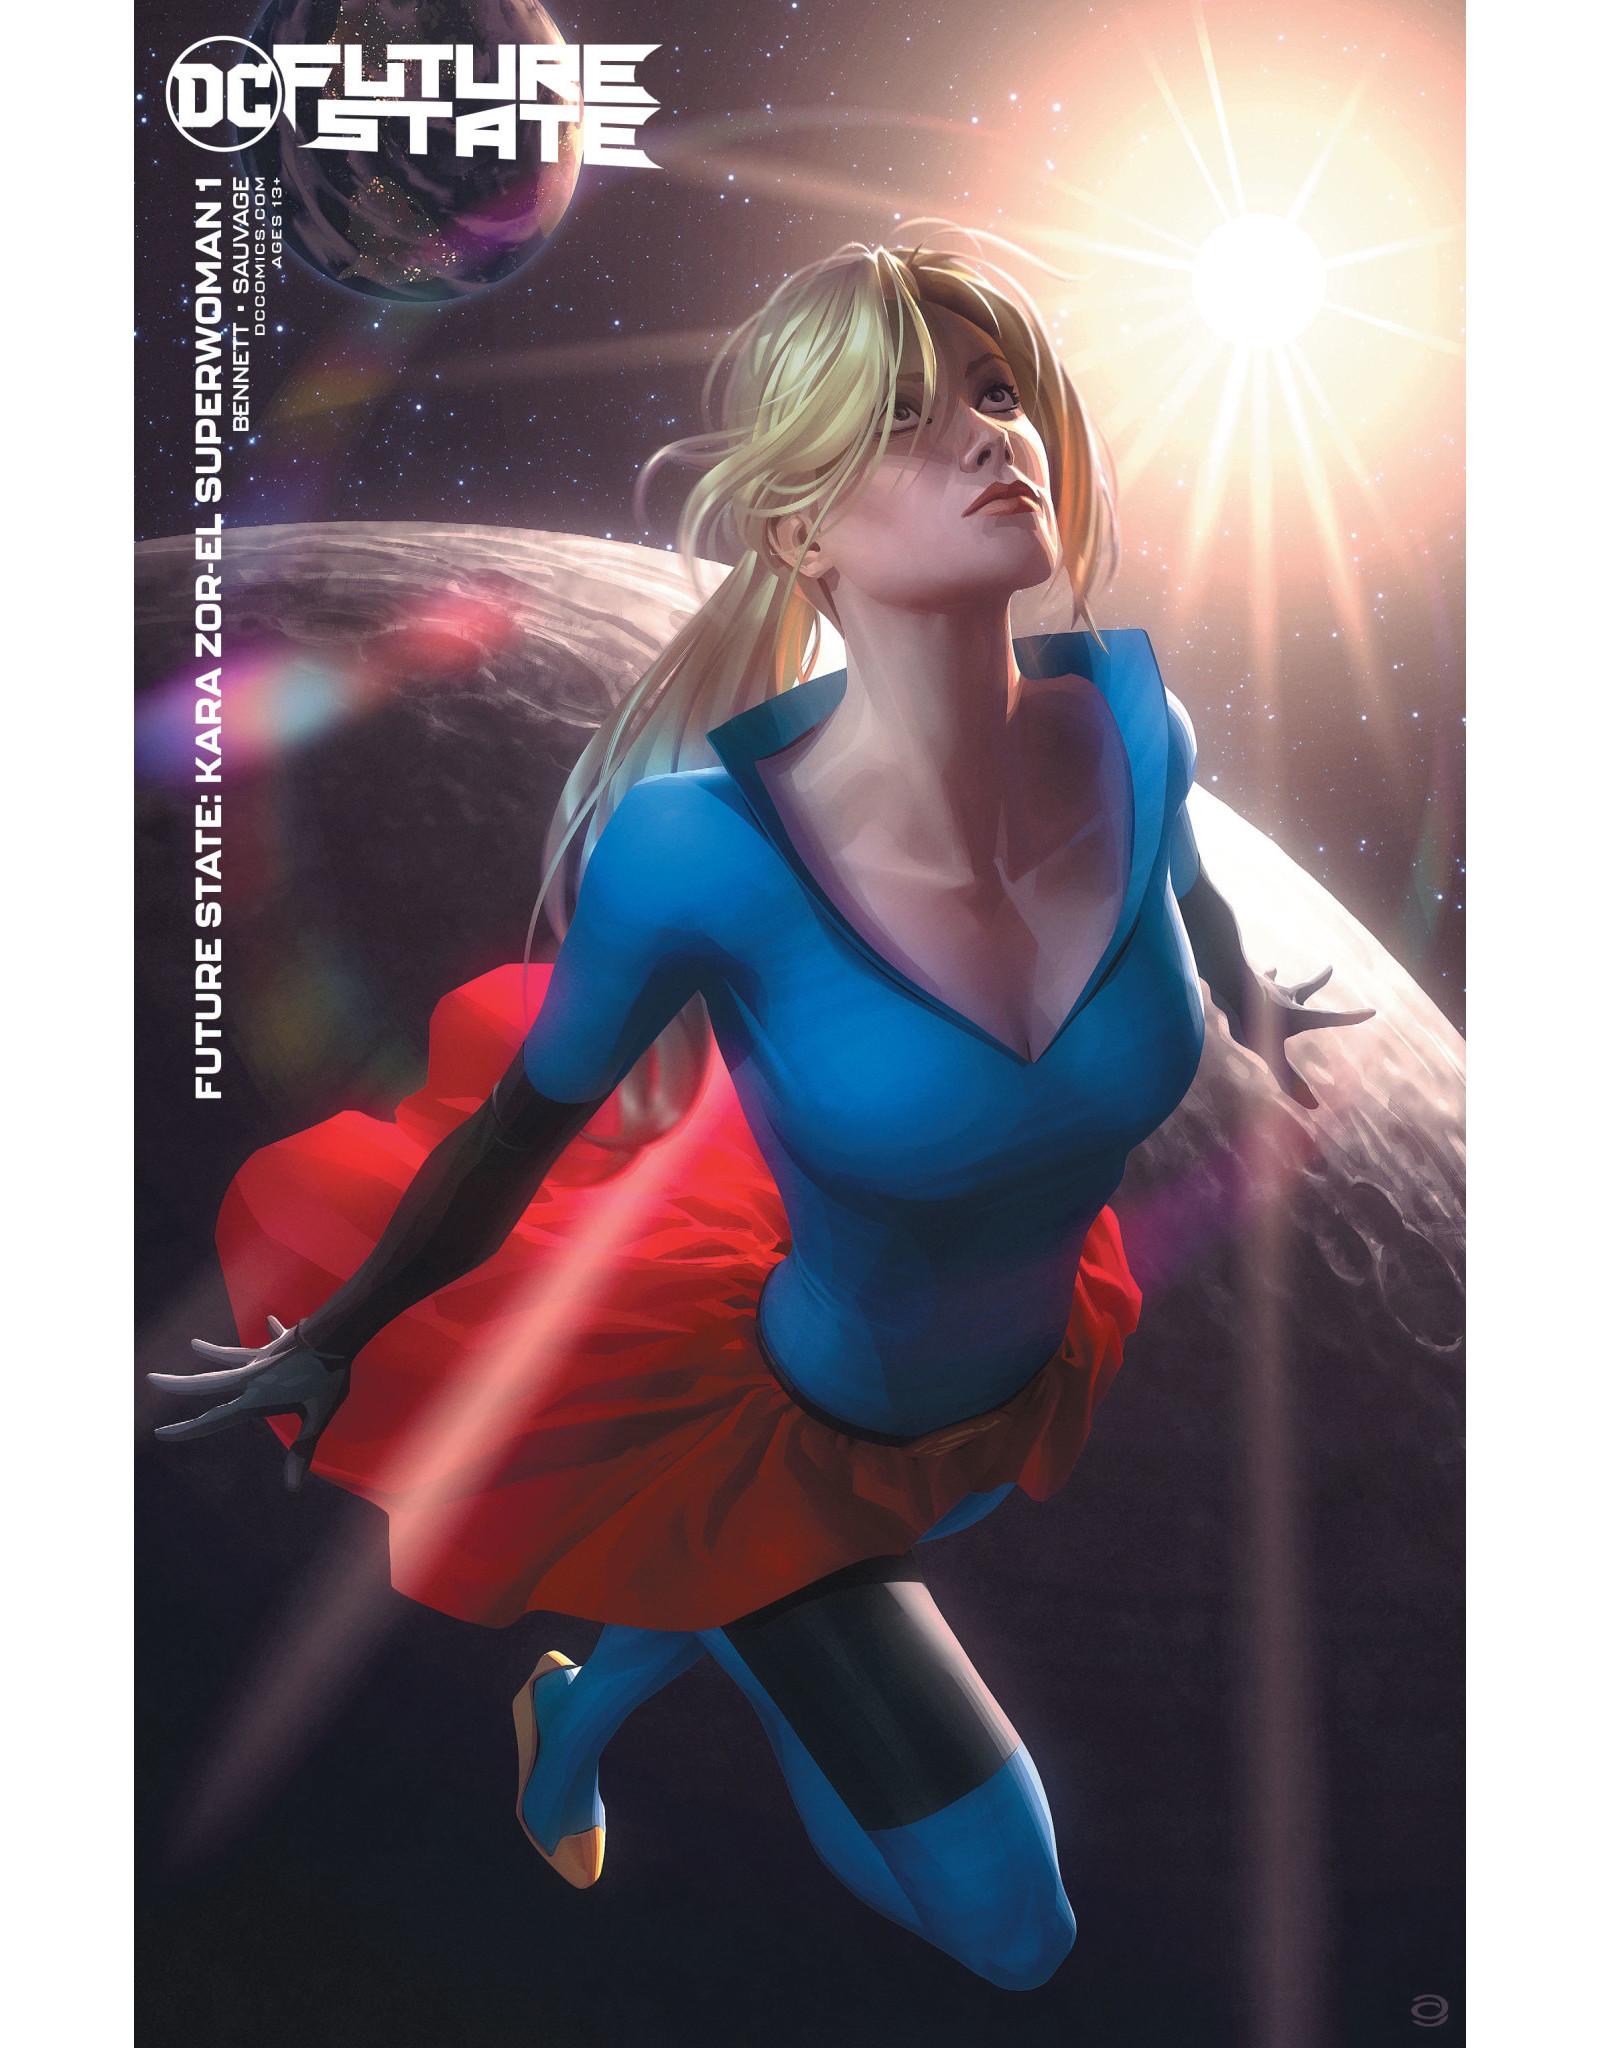 DC Comics FUTURE STATE KARA ZOR-EL SUPERWOMAN #1 (OF 2) CVR B ALEX GARNER CARD STOCK VAR